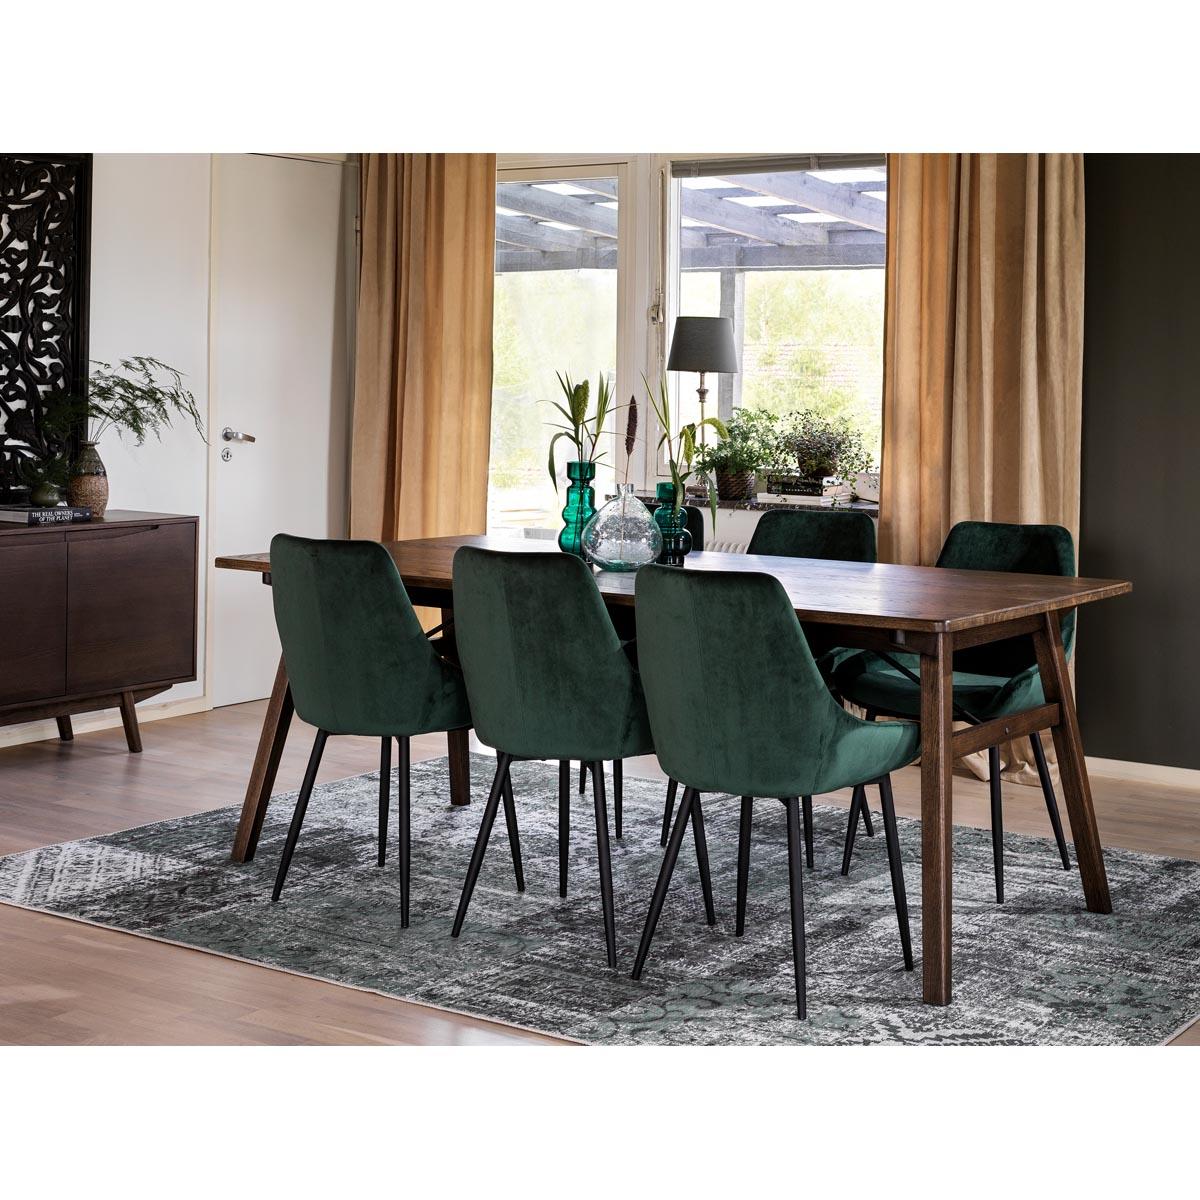 Graham-matbord-morkbrun-118935-ebbot-Sierra-stol-svart